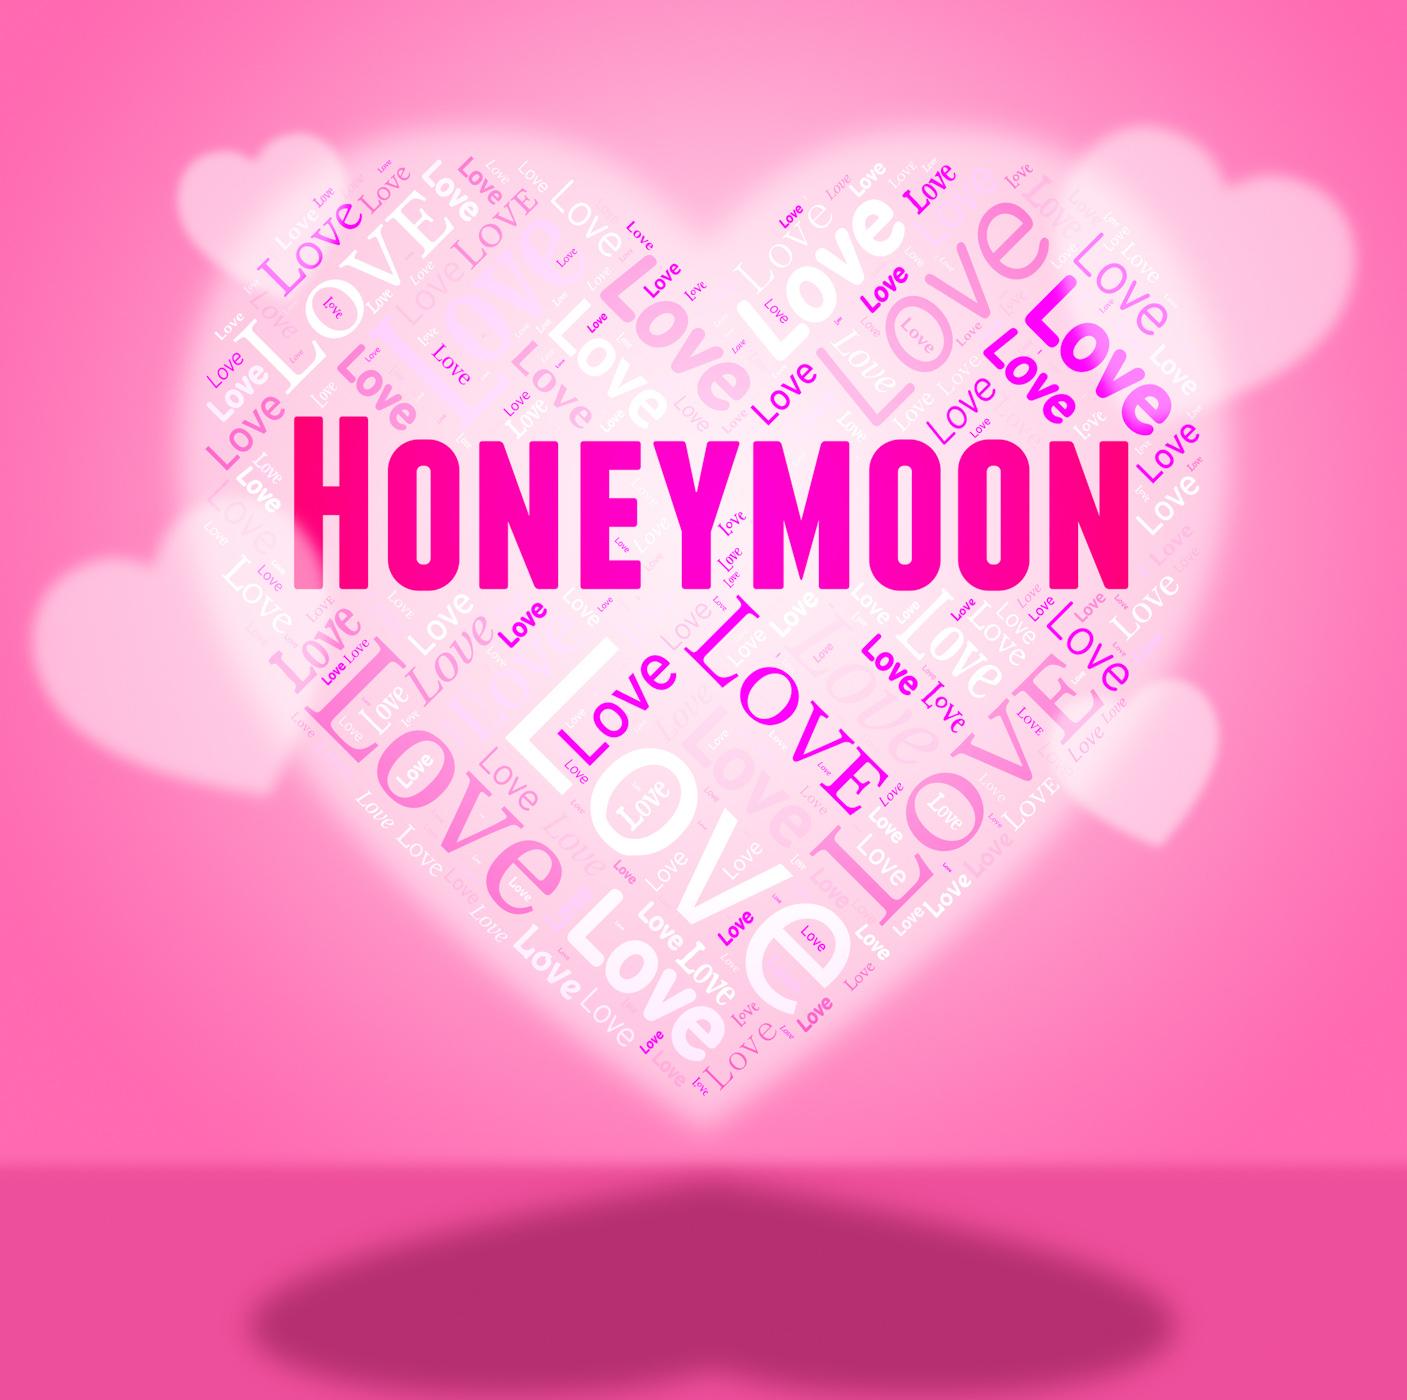 Honeymoon Heart Indicates In Love And Break, Break, Loving, Vacations, Vacationing, HQ Photo